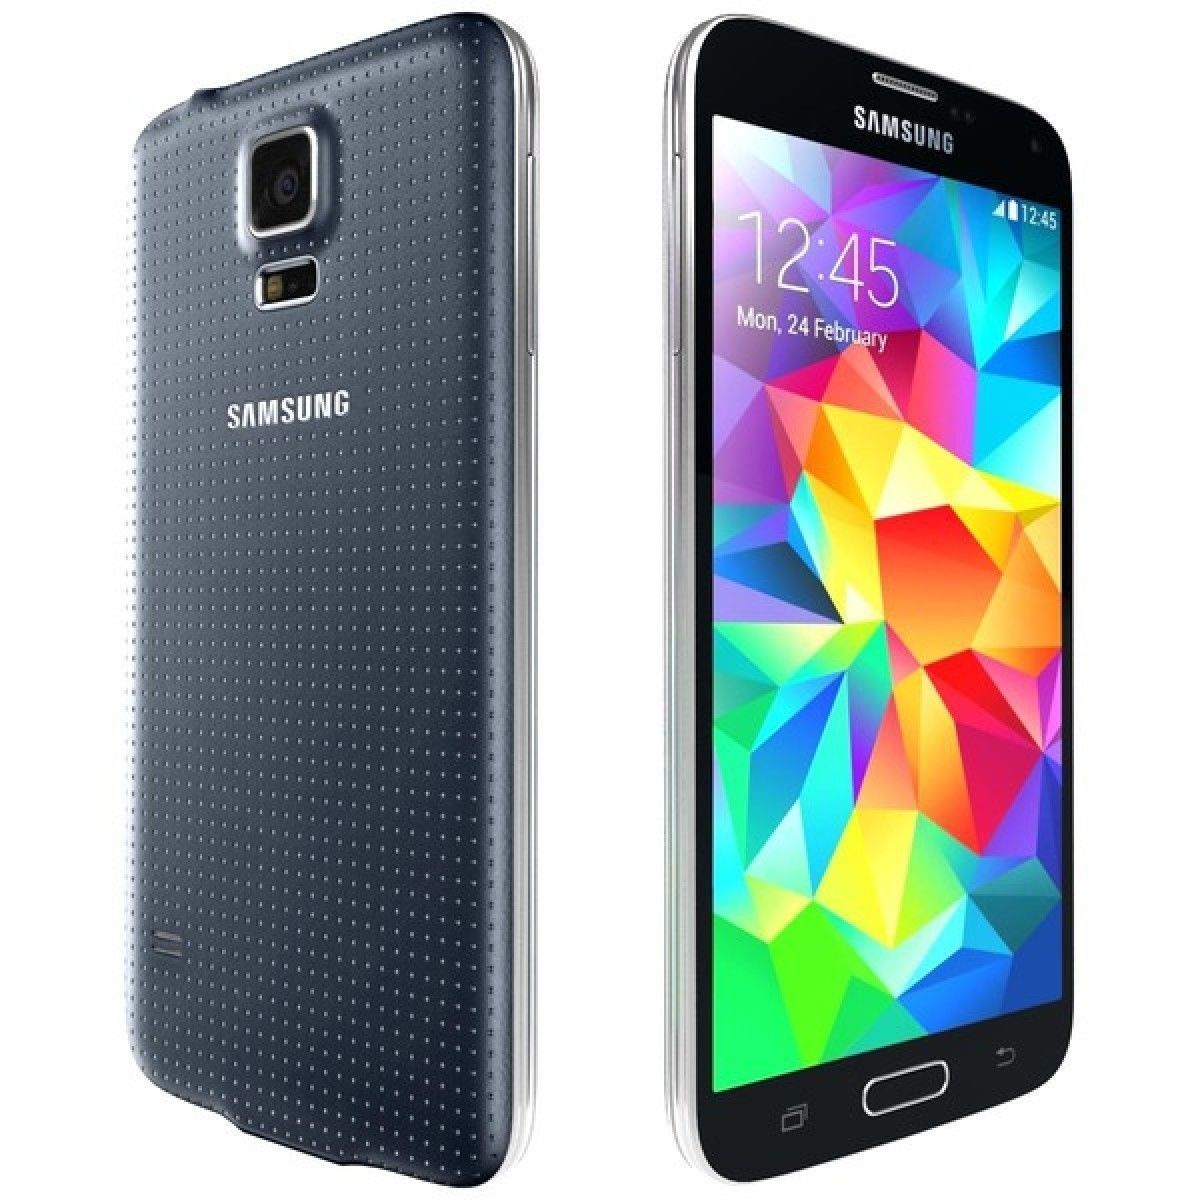 Samsung Galaxy S5 Verizon G900V (Black/New/Unlocked)